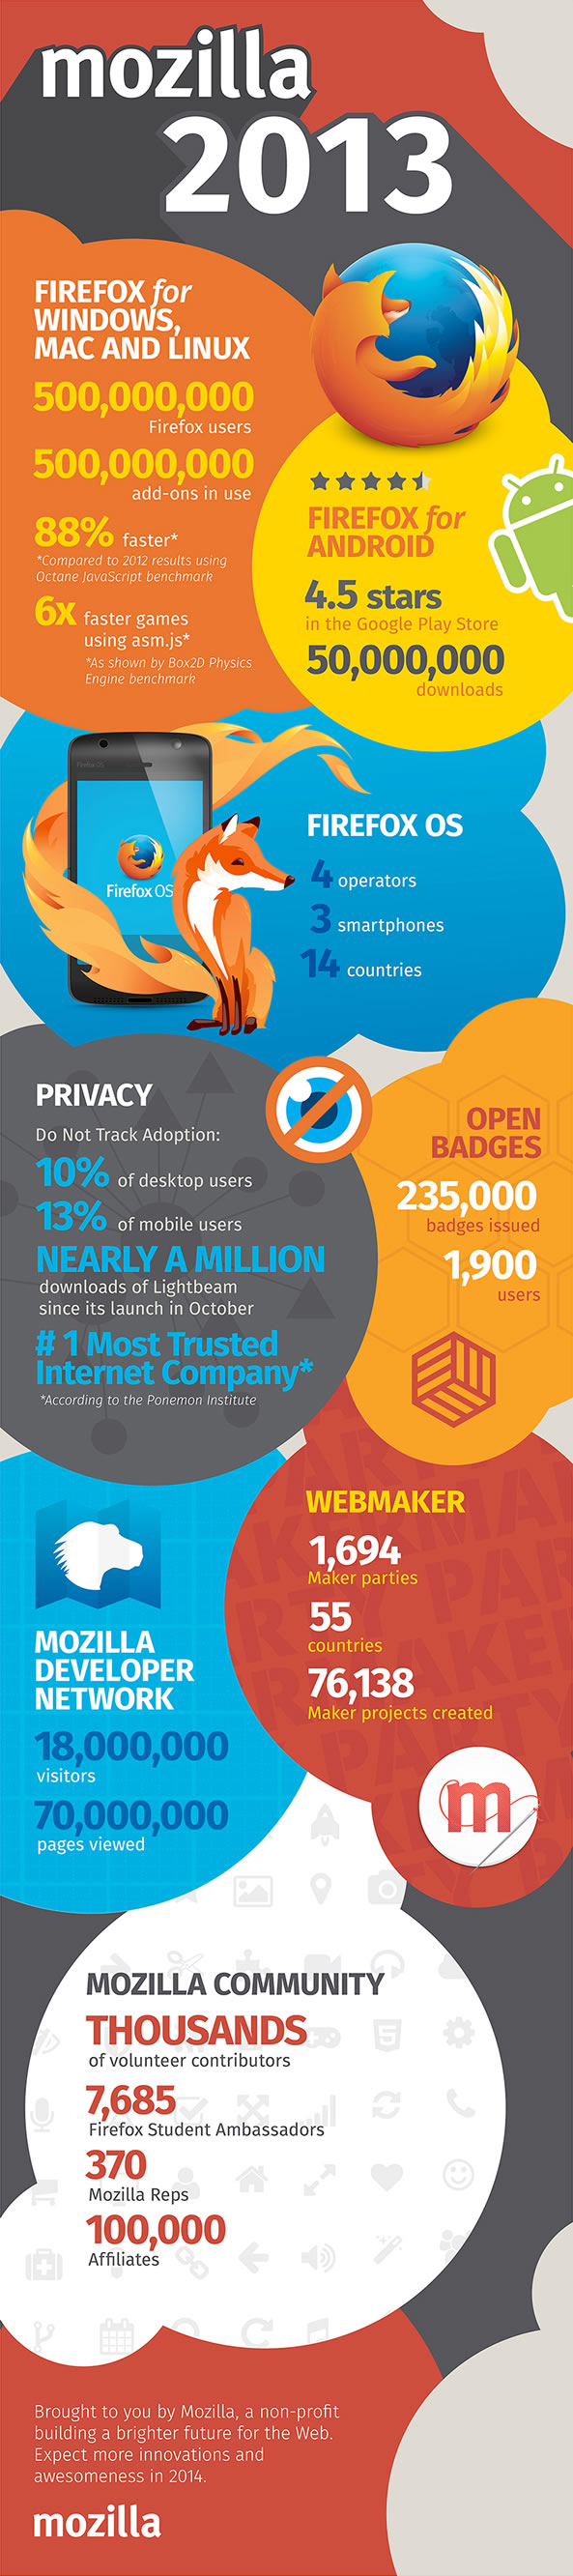 Infographie Mozilla Firefox 2013 - Bilan de l'activité de Firefox